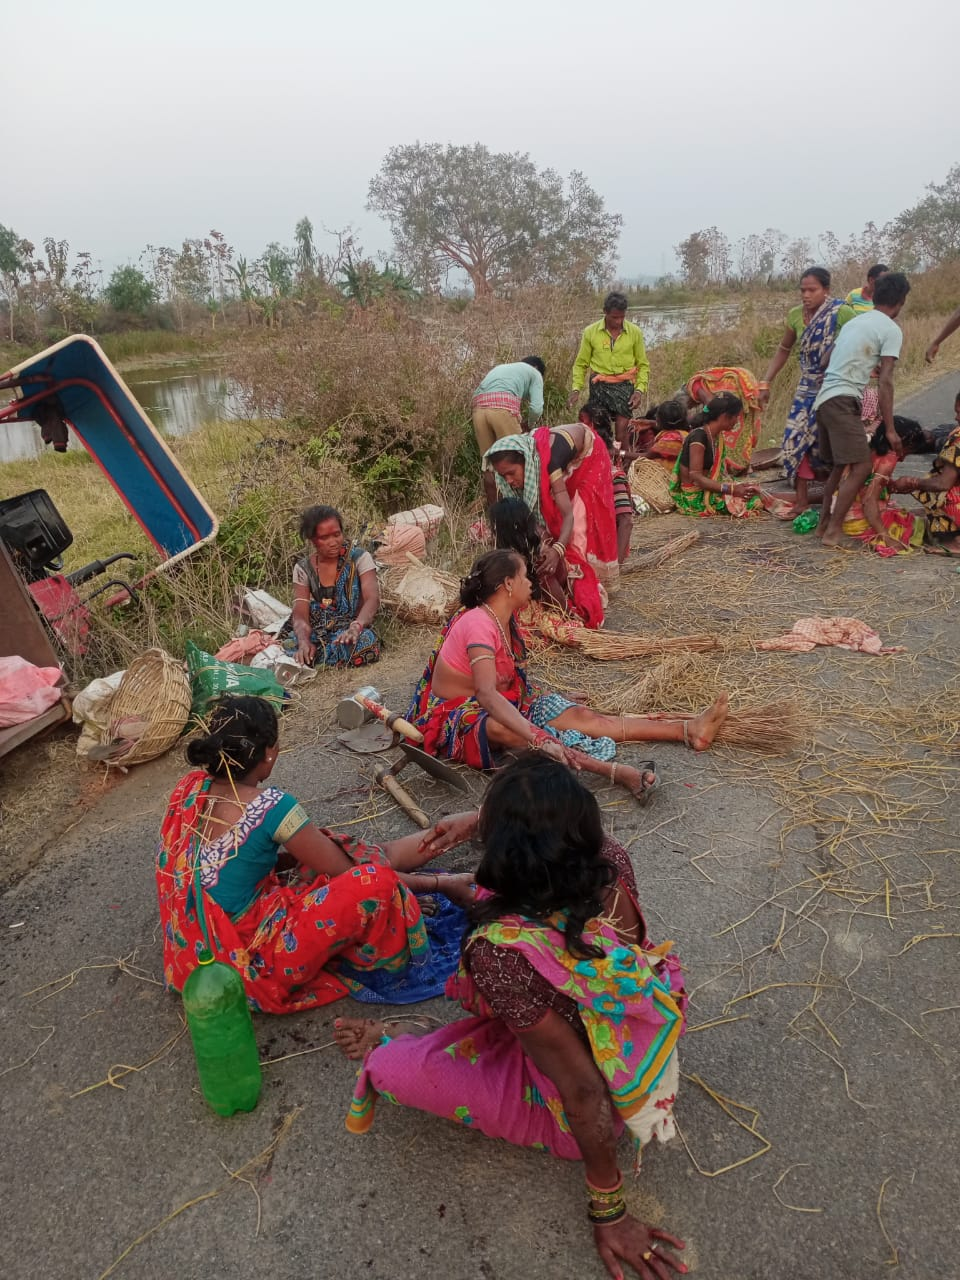 Tractor Overturns In Ganjam, 17 Labour Injured